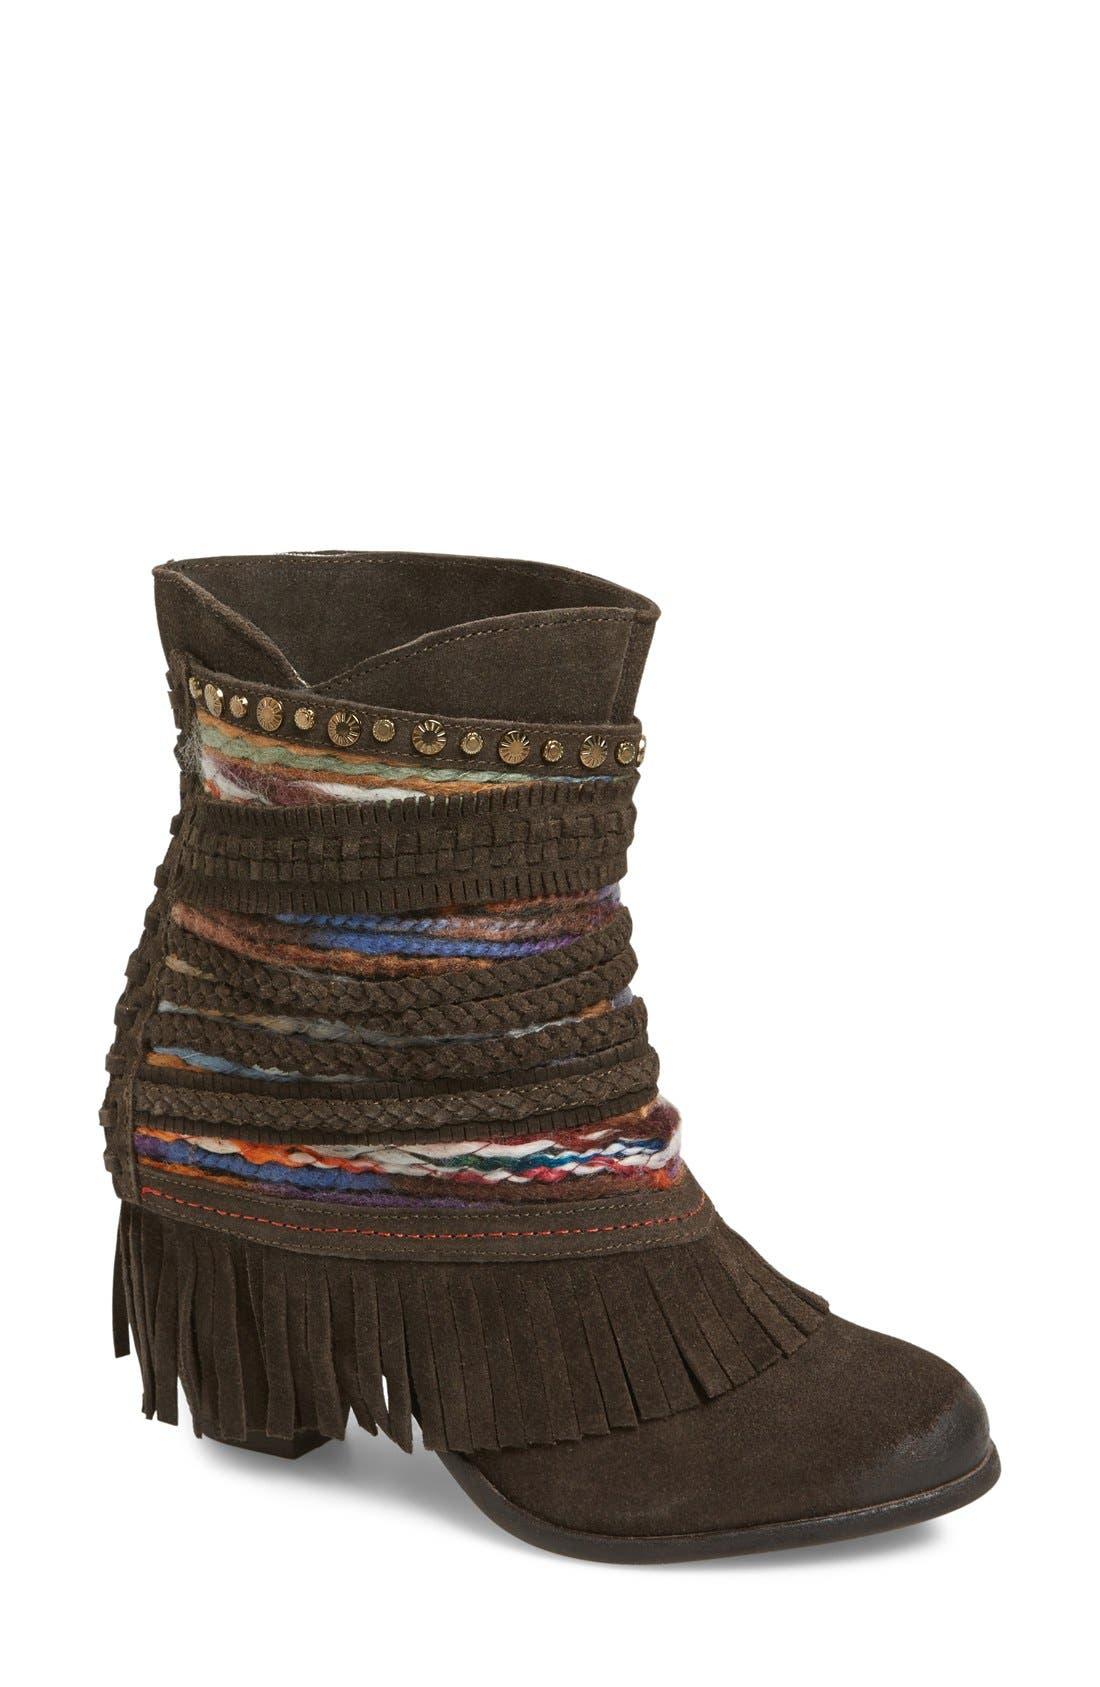 Main Image - Naughty Monkey 'Poncho' Boot (Women)